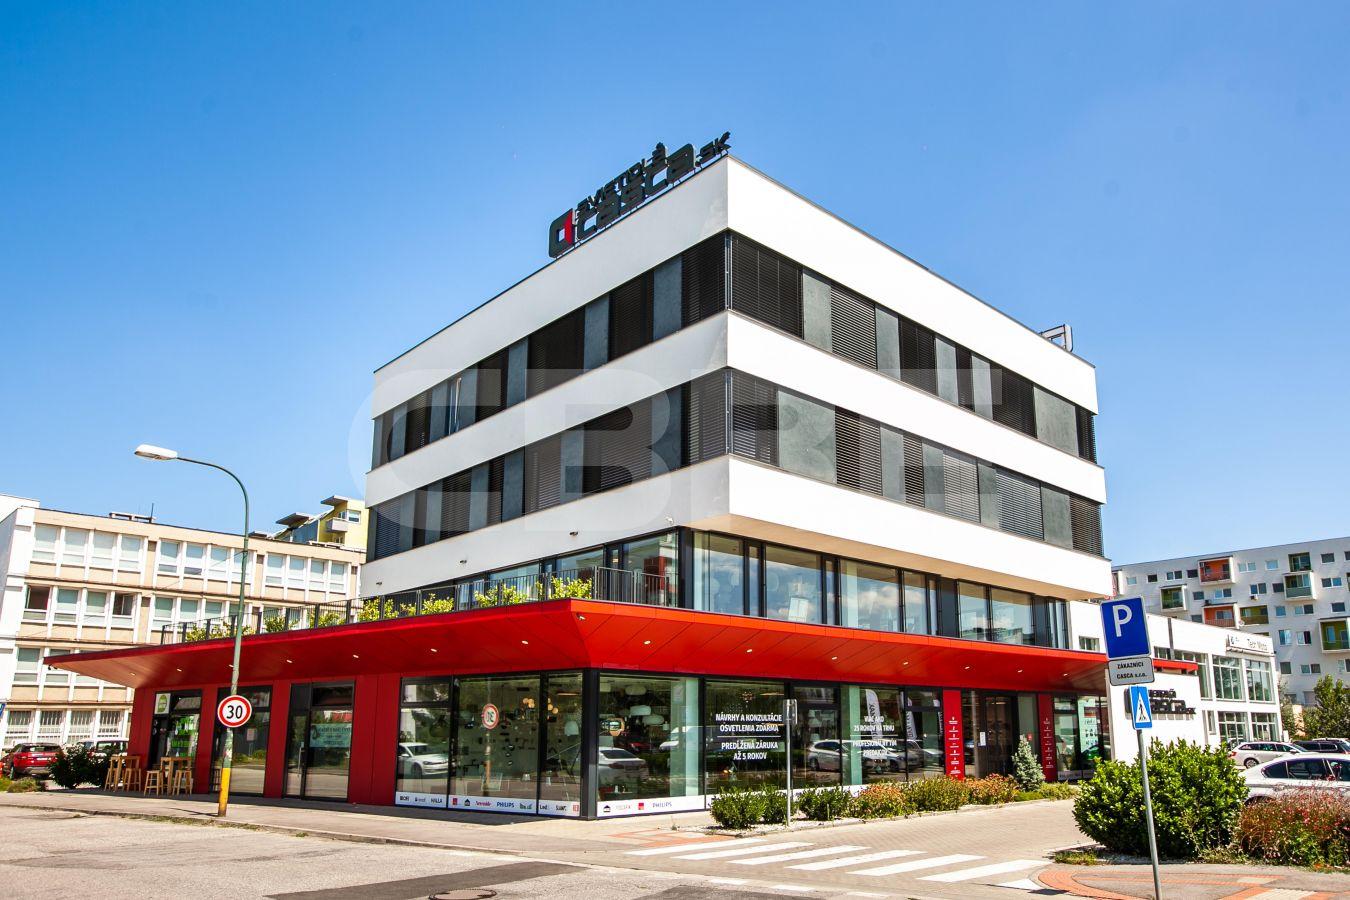 Casca - Ivánska cesta, Bratislava - Ružinov | Offices for rent by CBRE | 2